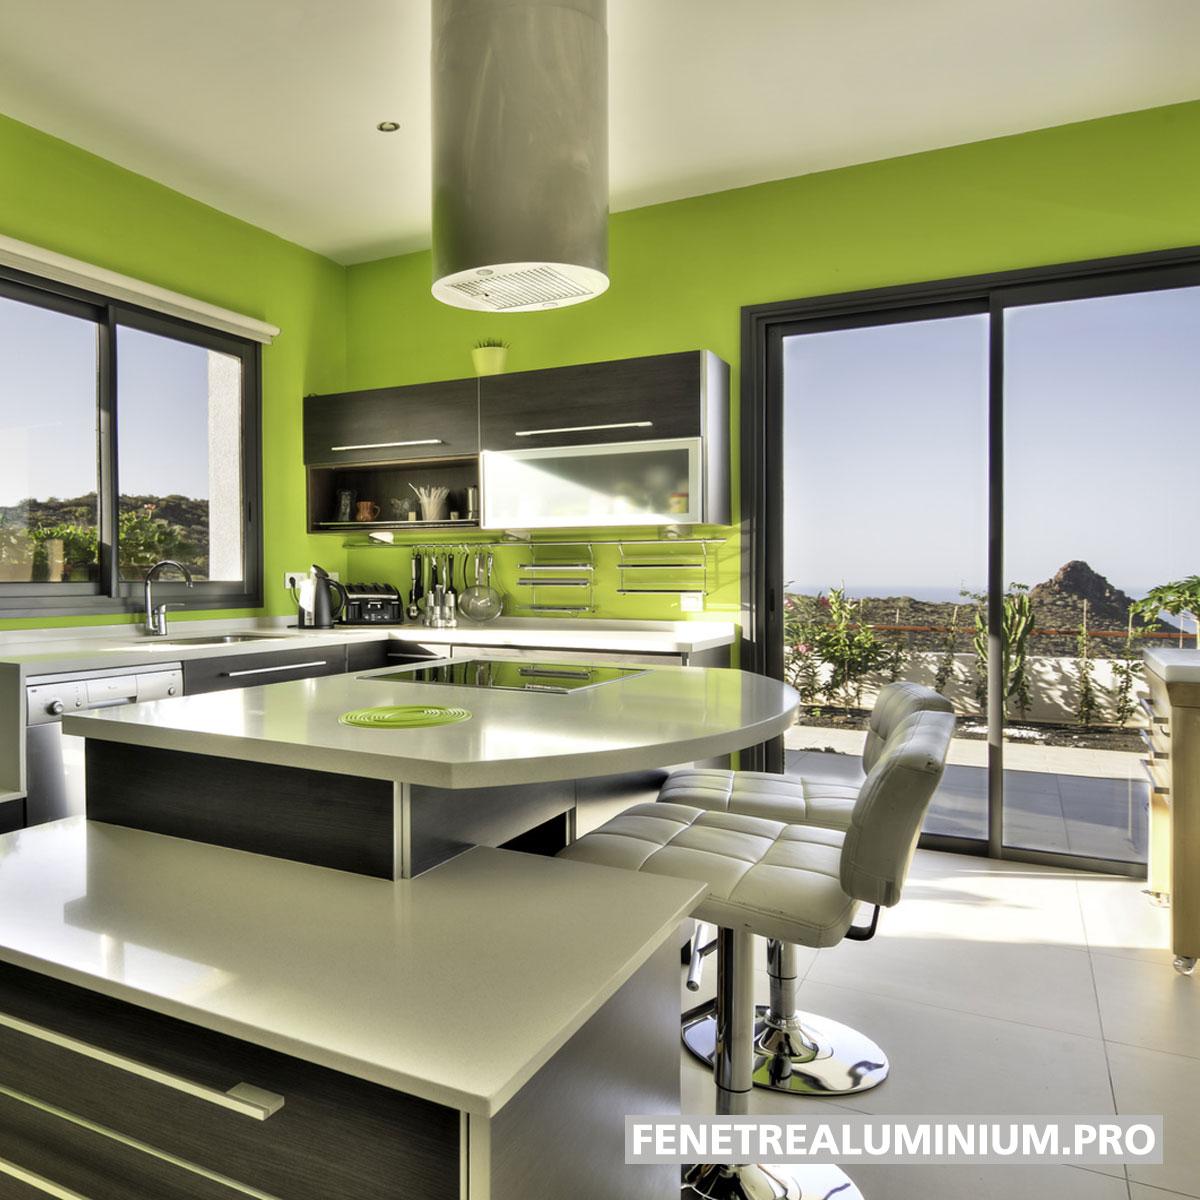 cuisine baie vitree lumiere